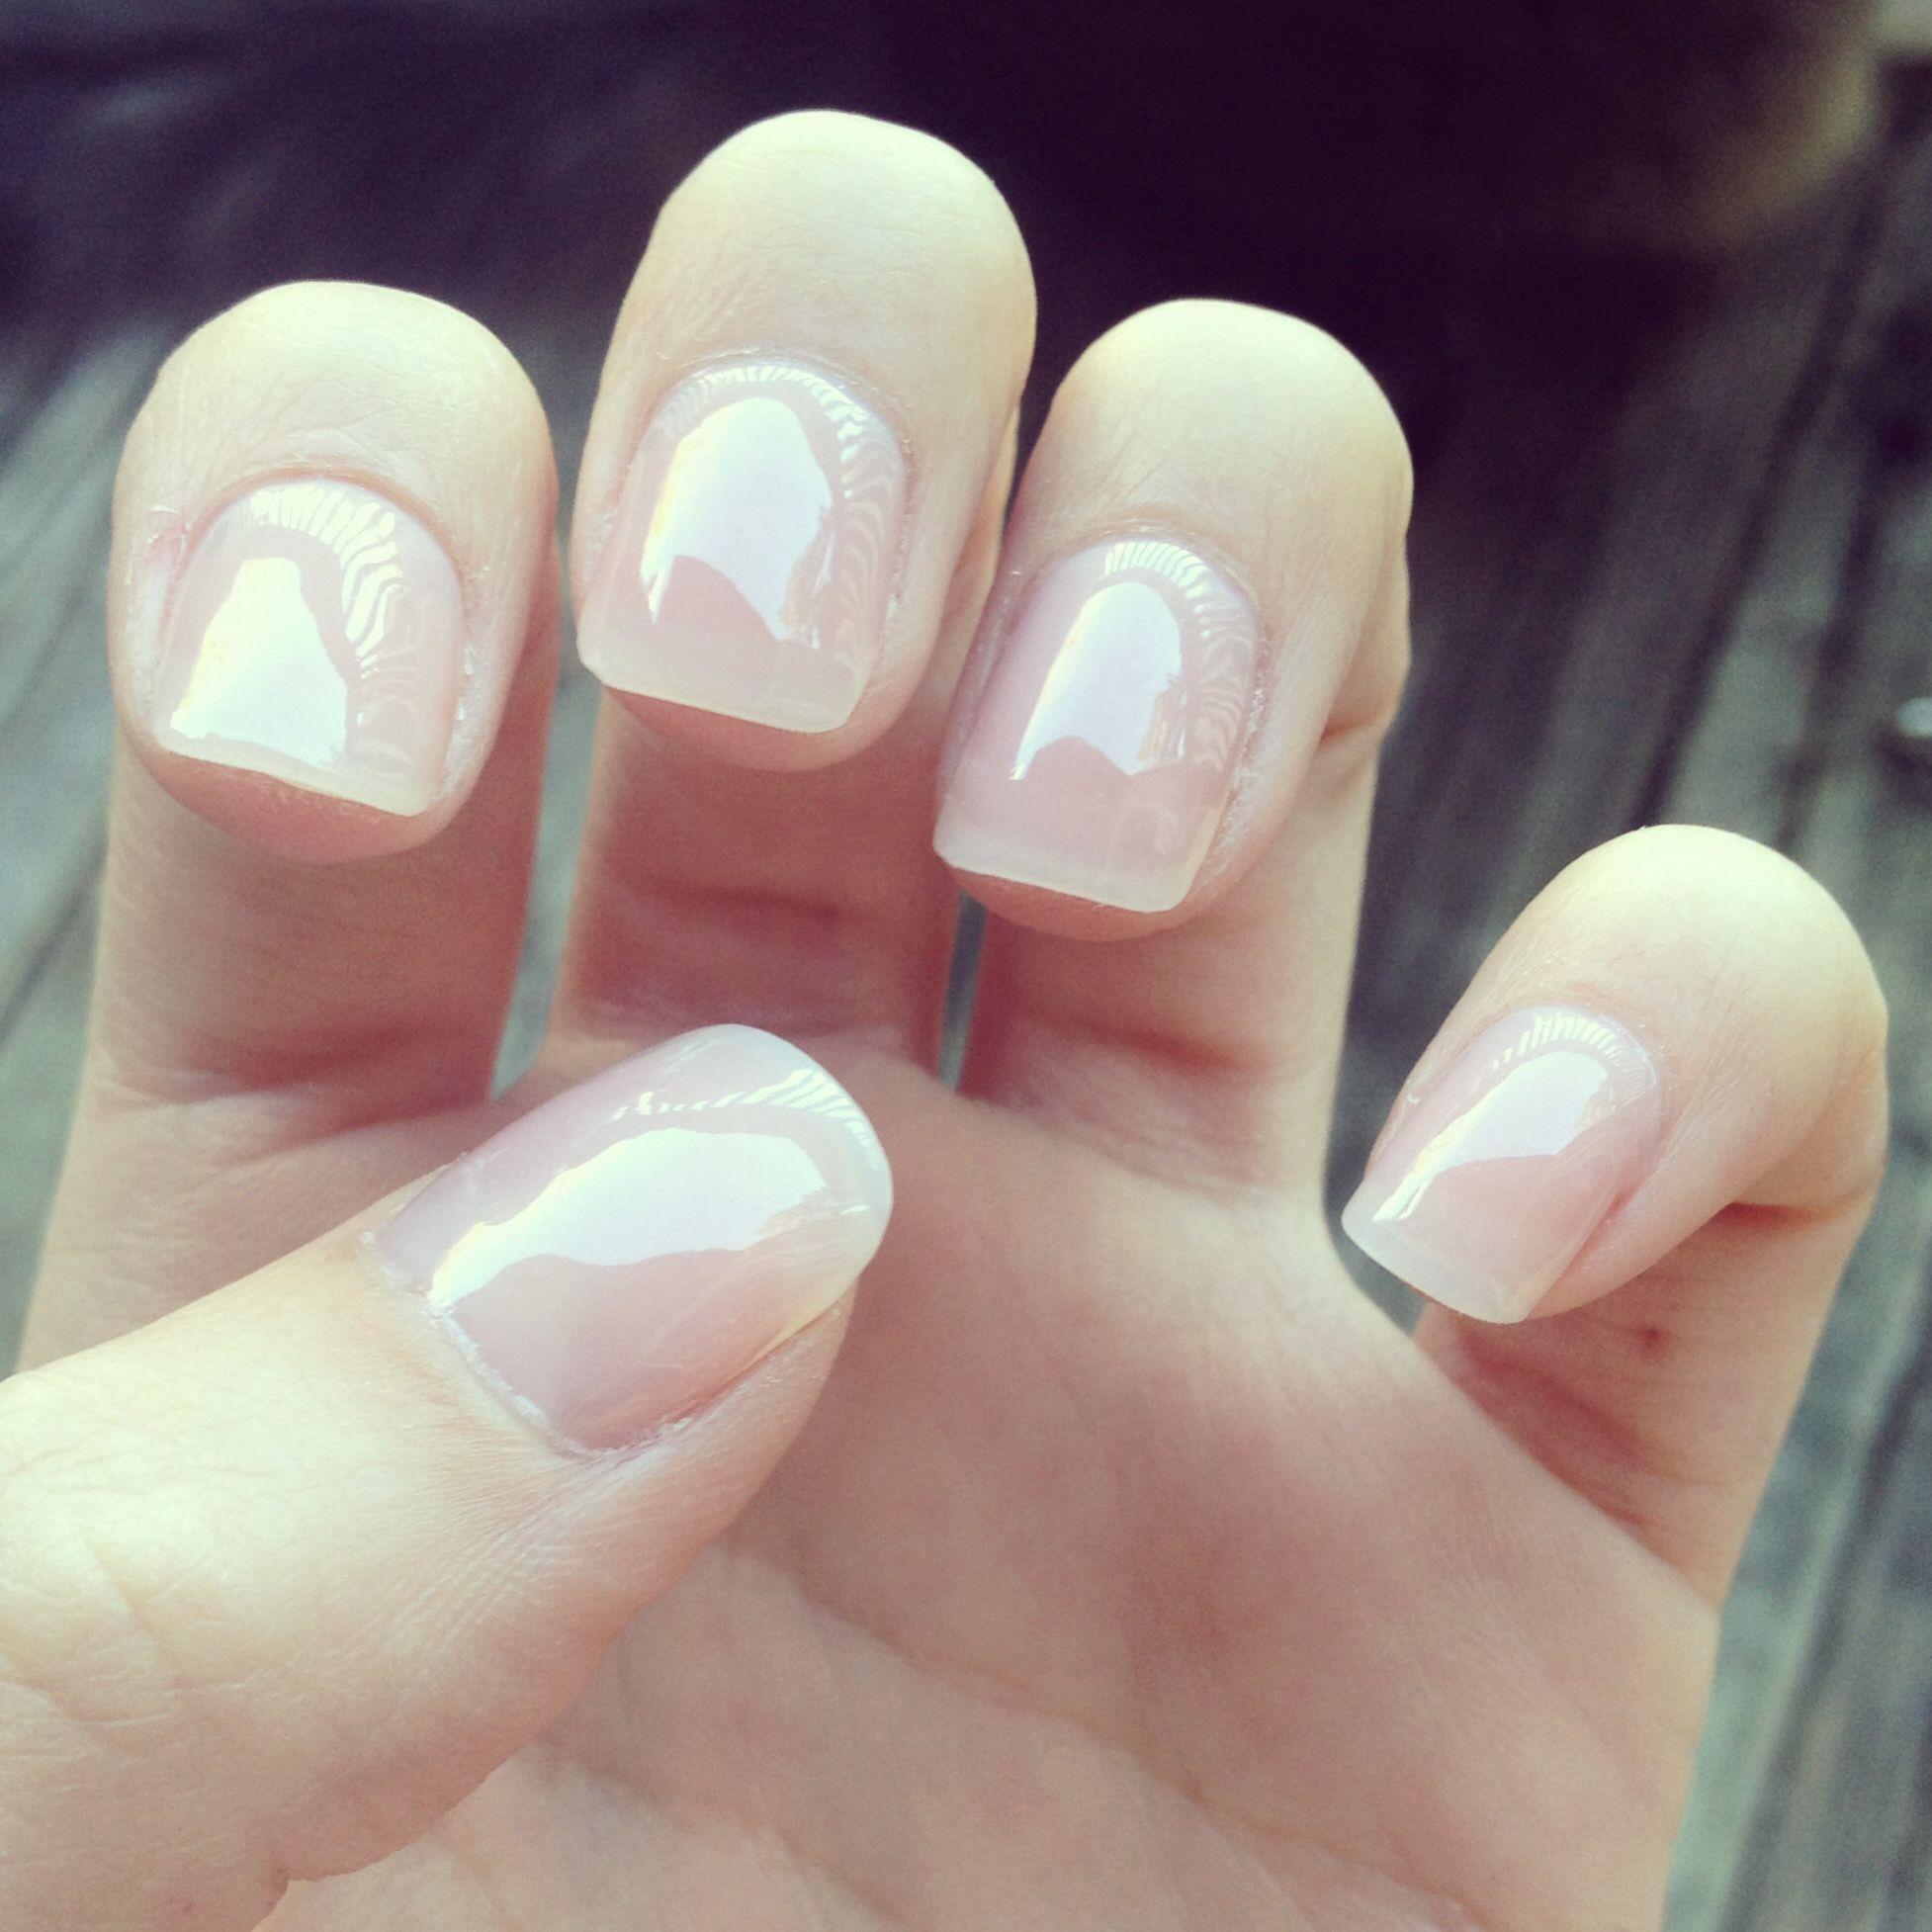 Essie Sugar Daddy Nails In 2019 Nails Neutral Nails Wedding Nails